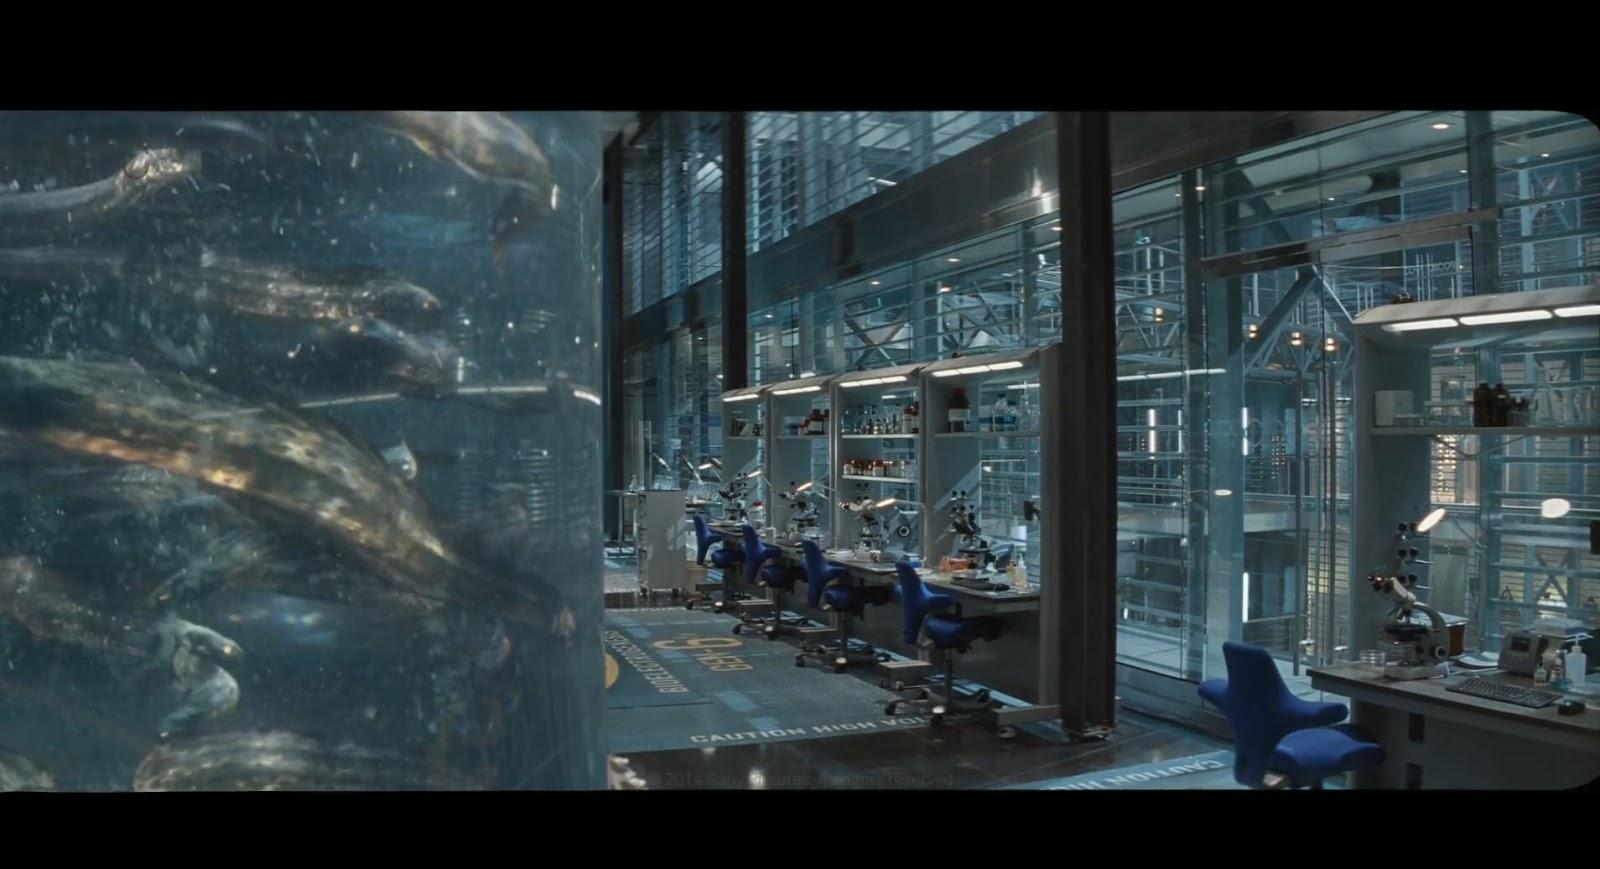 MPC The Amazing Spider Man 2 VFX breakdown